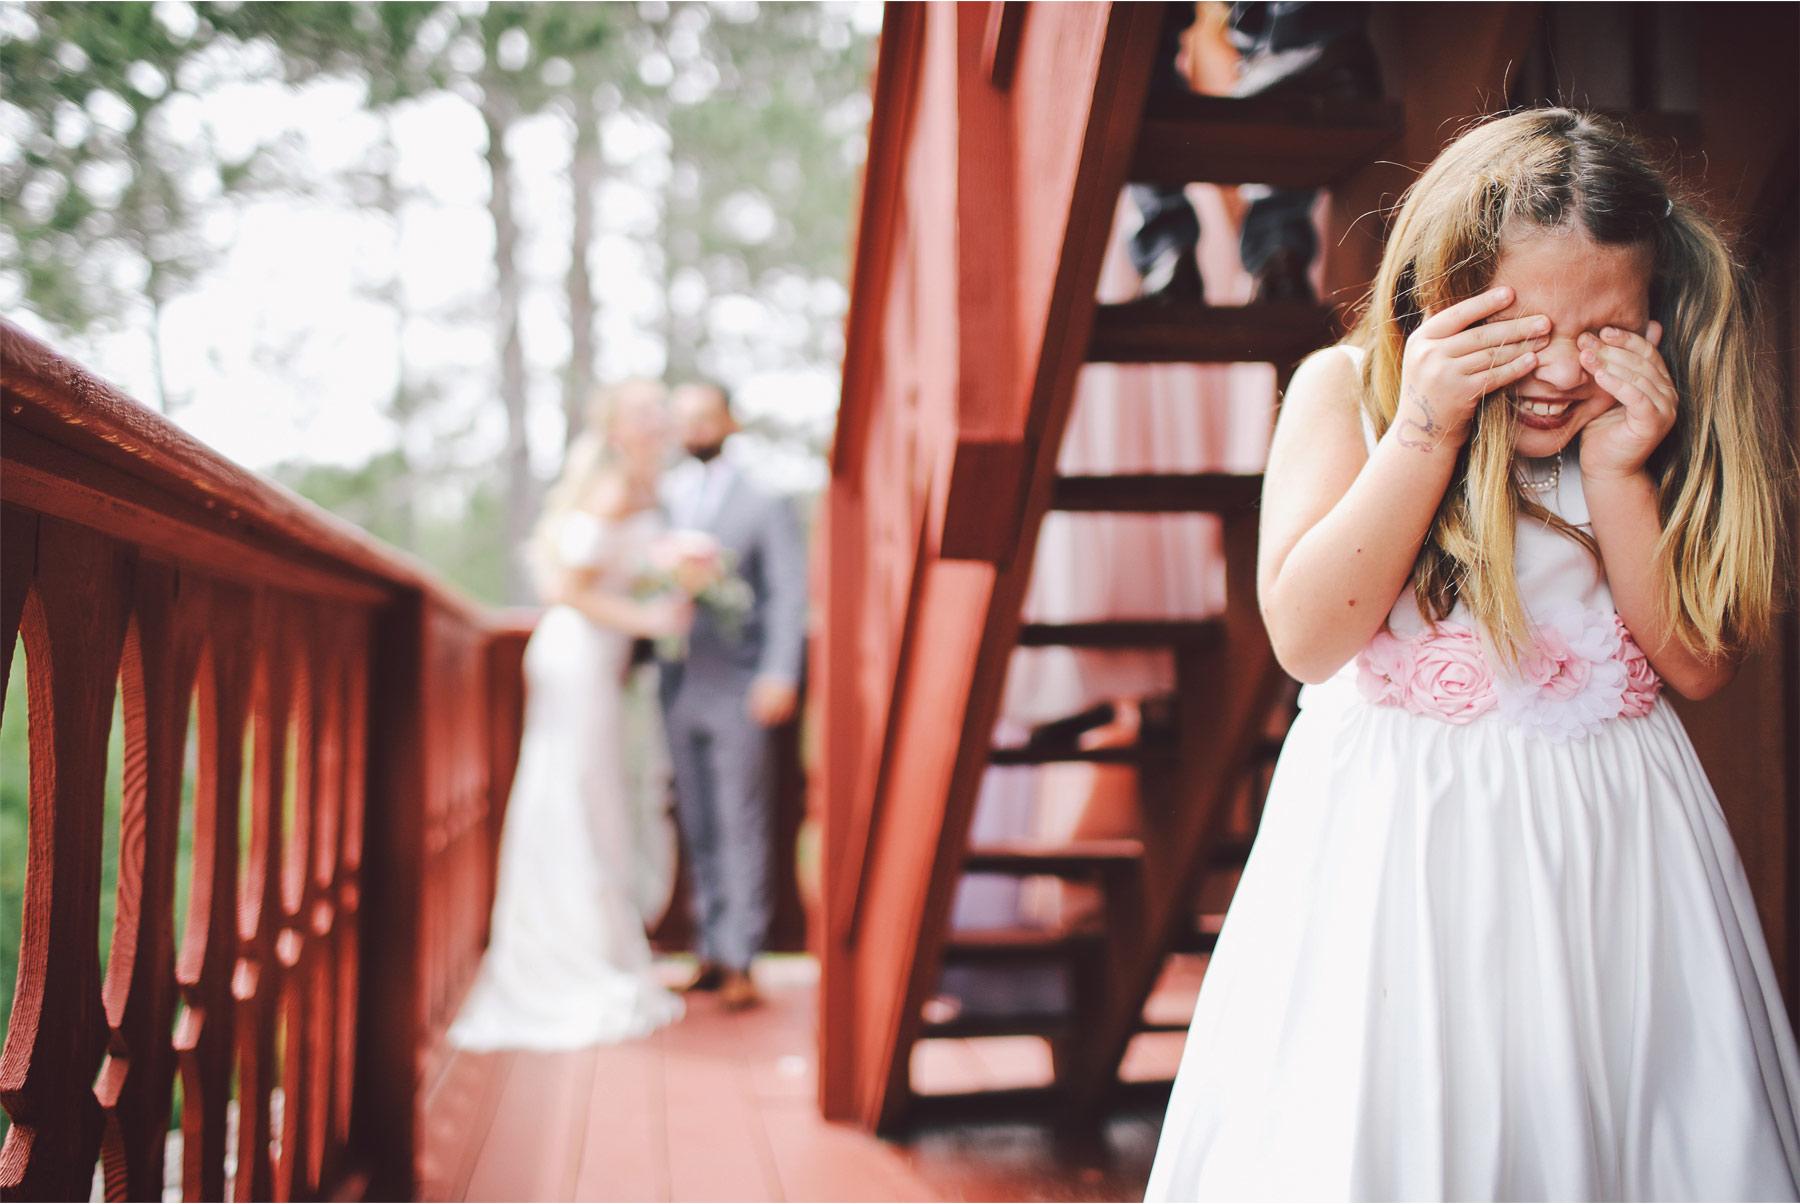 08-Ely-Minnesota-North-Wedding-by-Andrew-Vick-Photography-Bride-Groom-Kiss-Flower-Girl-Cabin-Woods-Katie-and-Joe.jpg